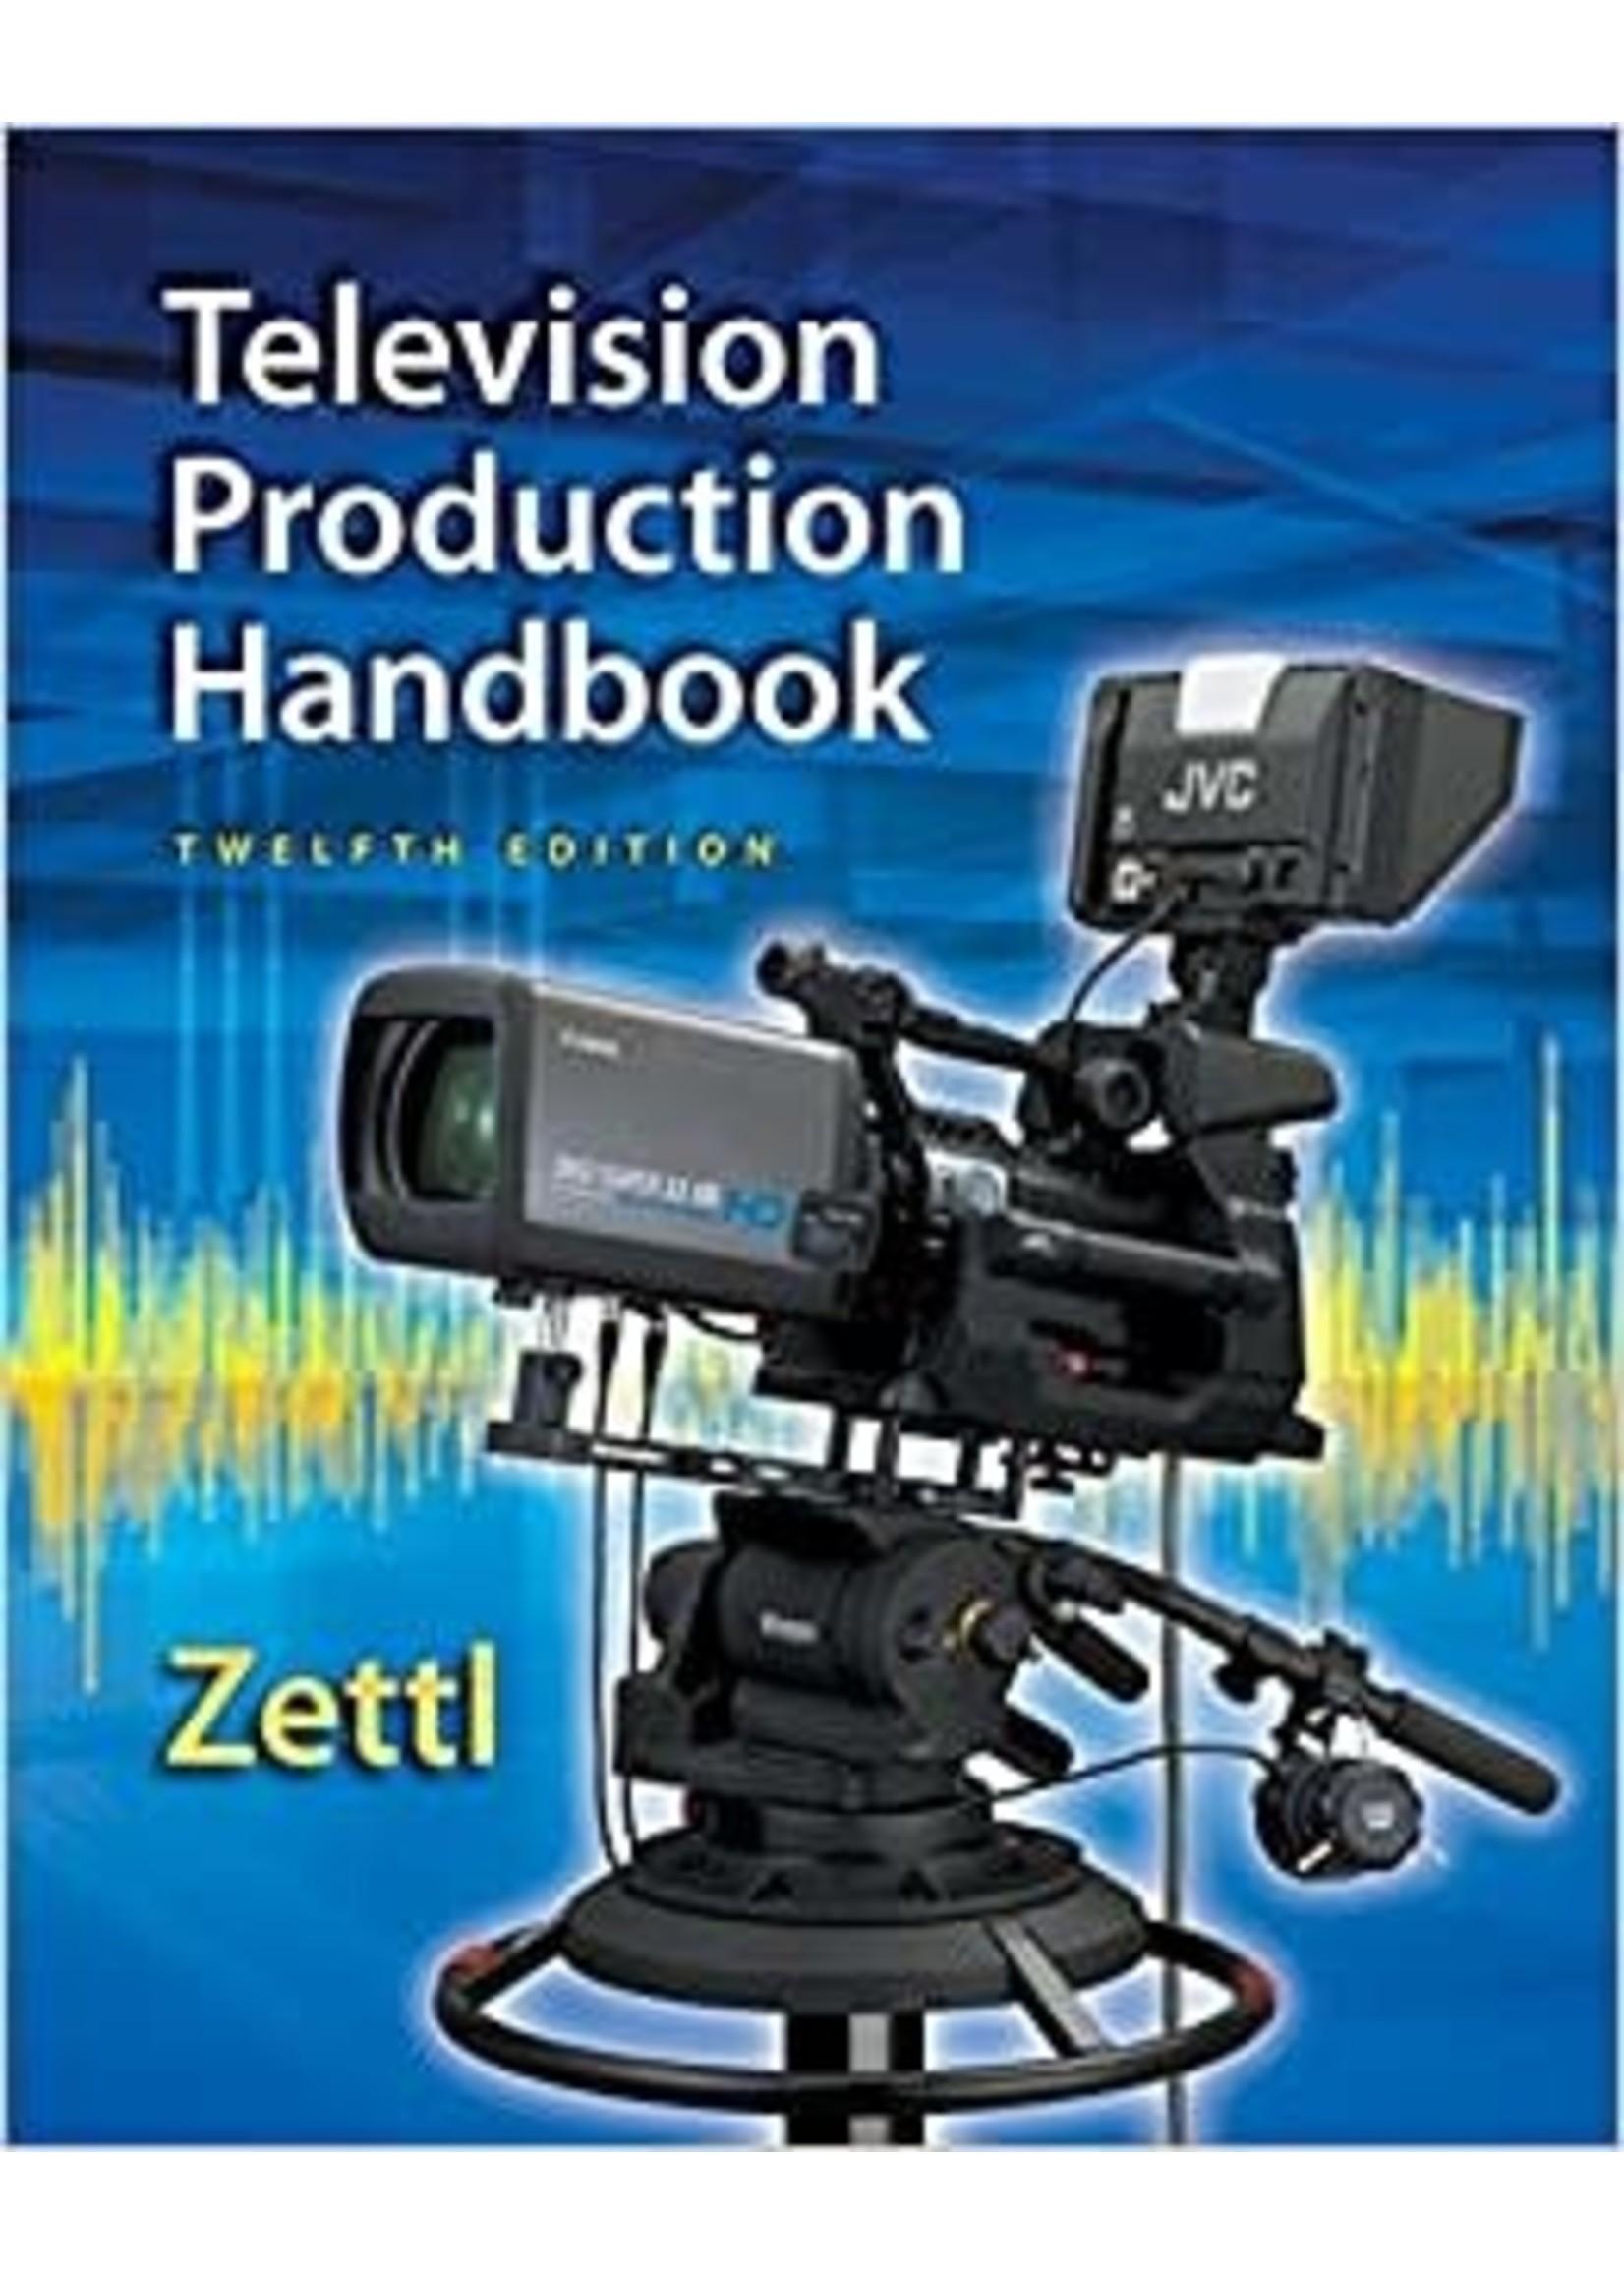 MC215 TELEVIOIOON PRODUCTION HANDBOOK(RENTAL)